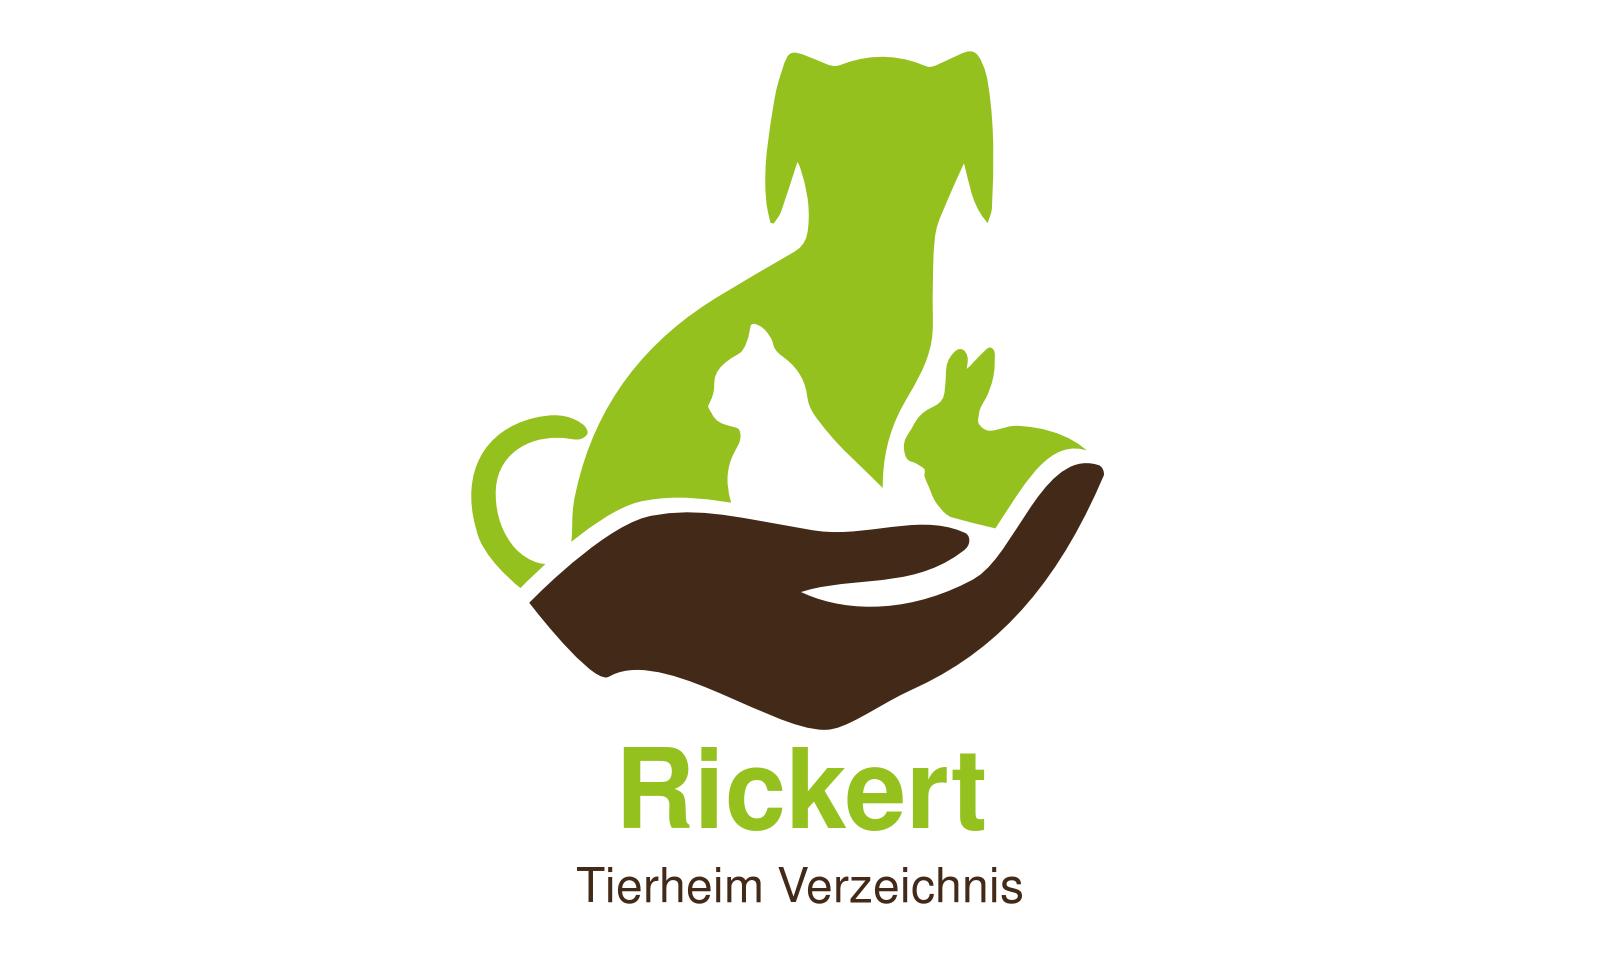 Tierheim Rickert